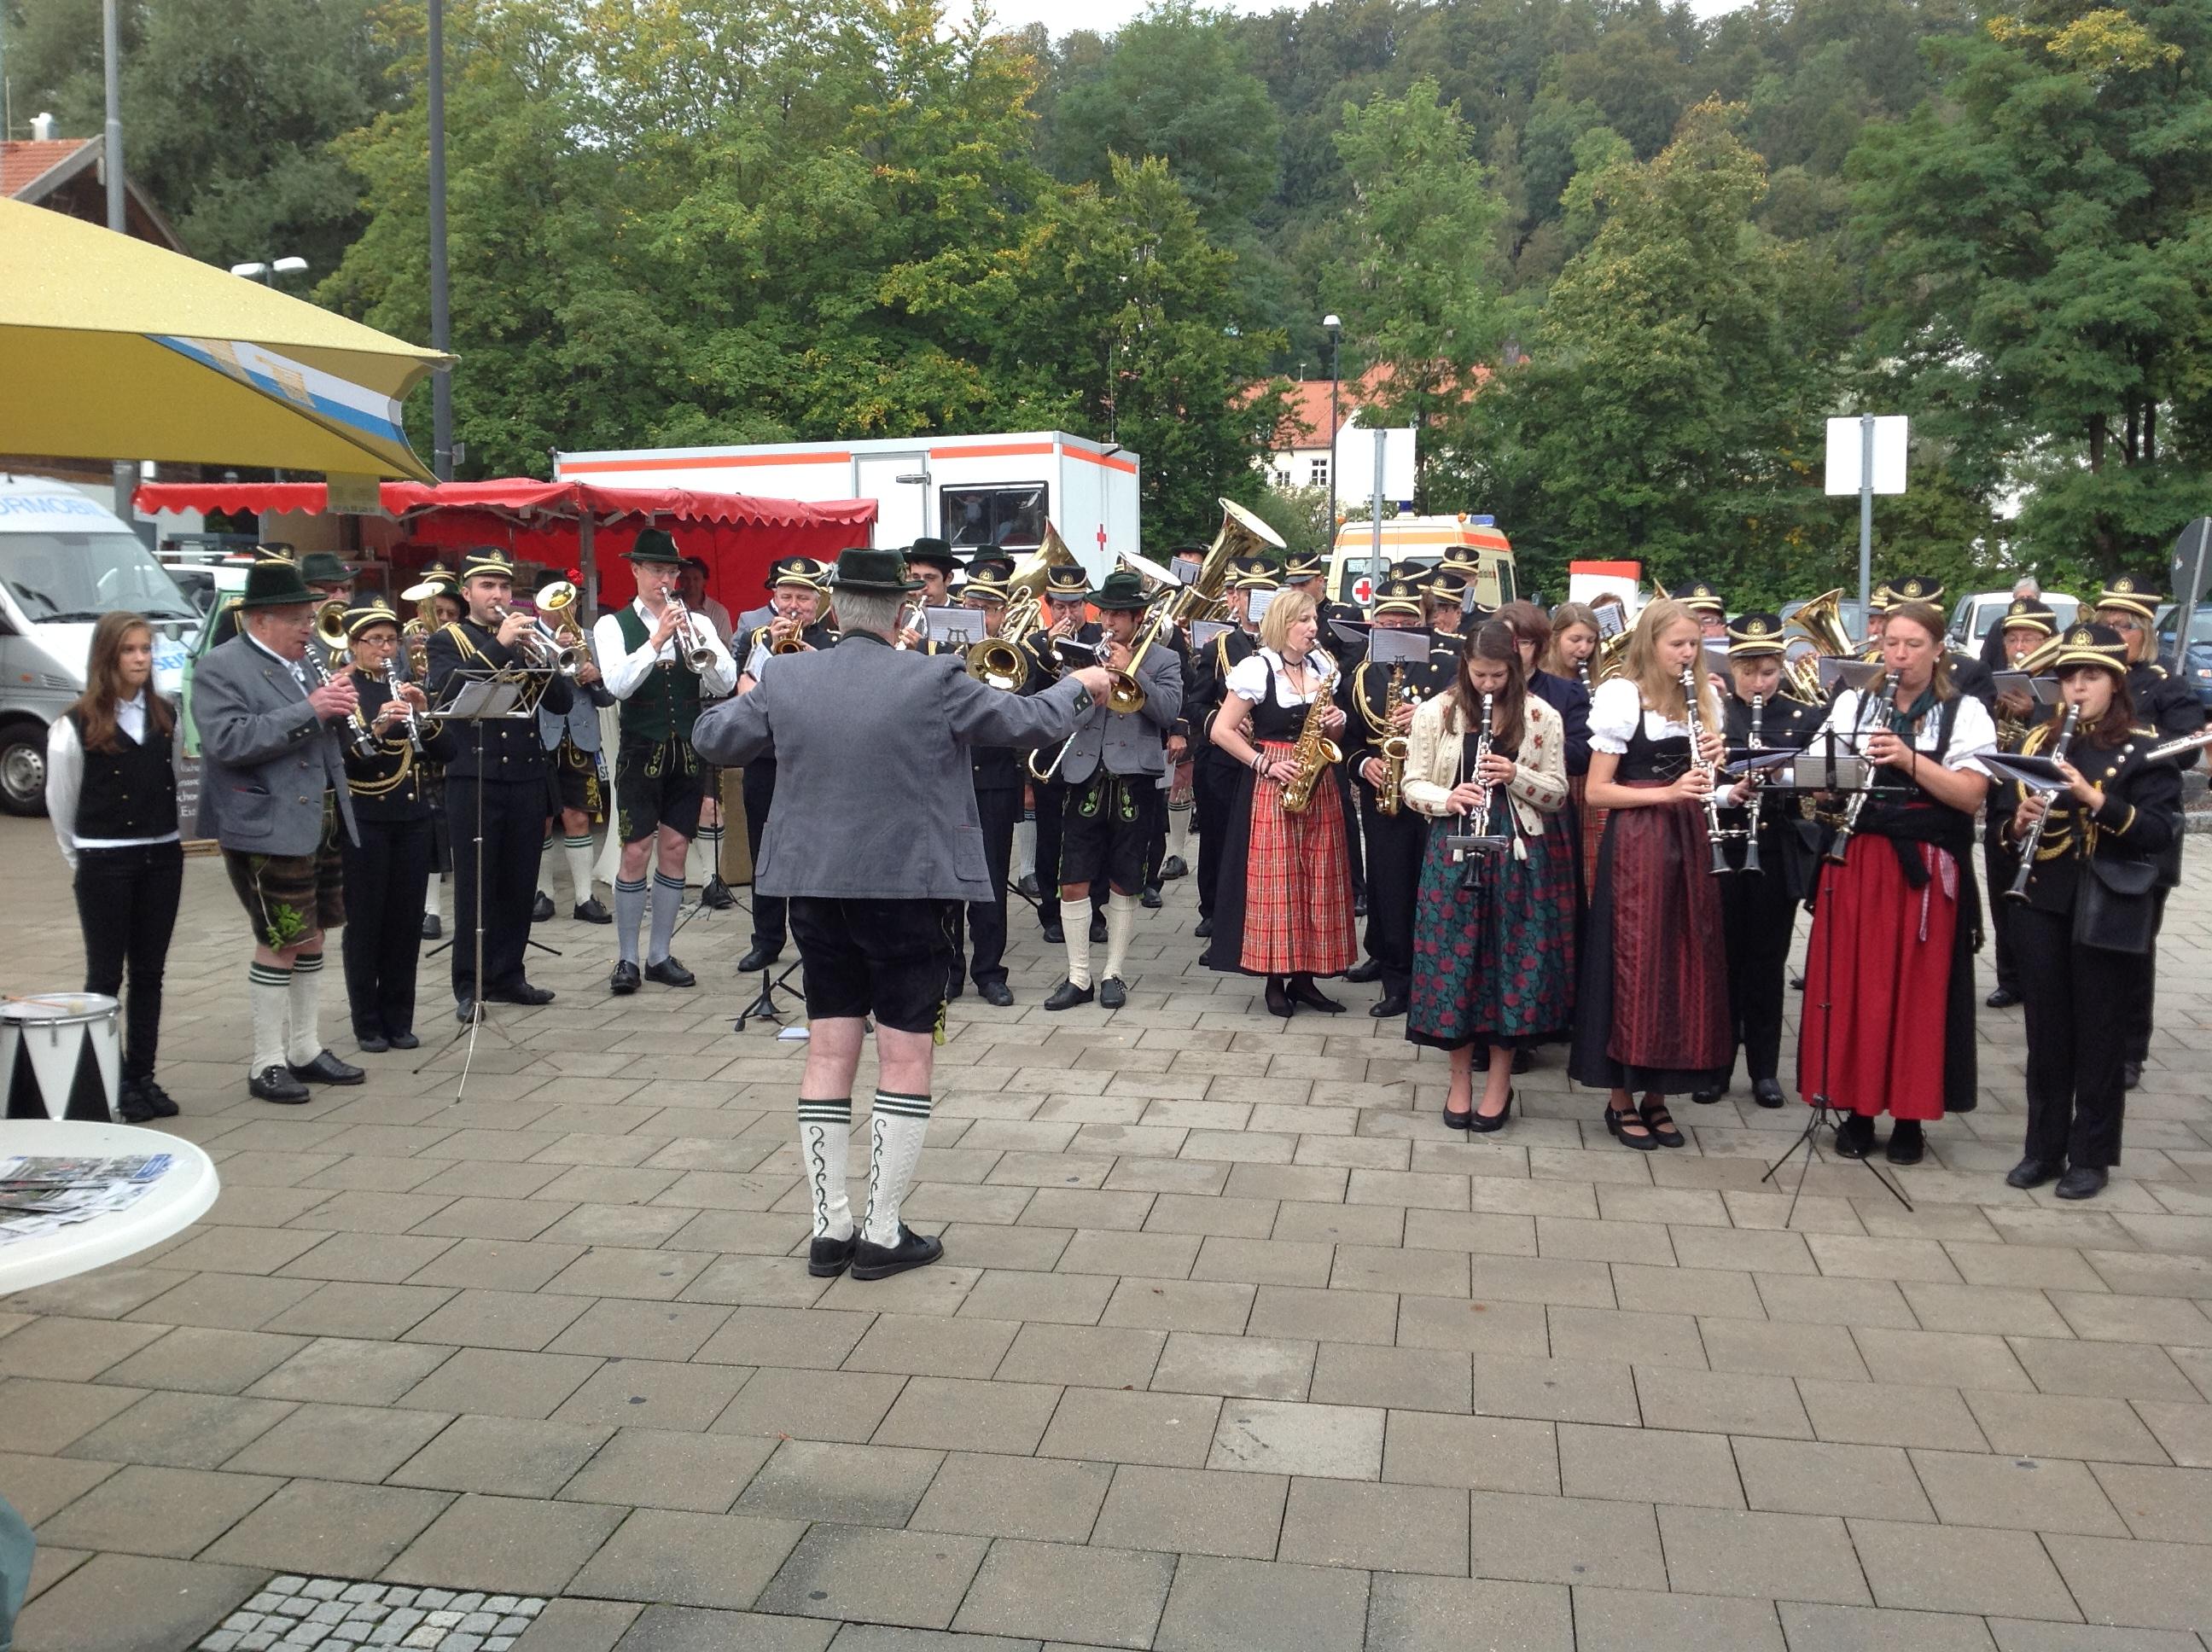 Wolfratshausen 2014, il concerto in piazza